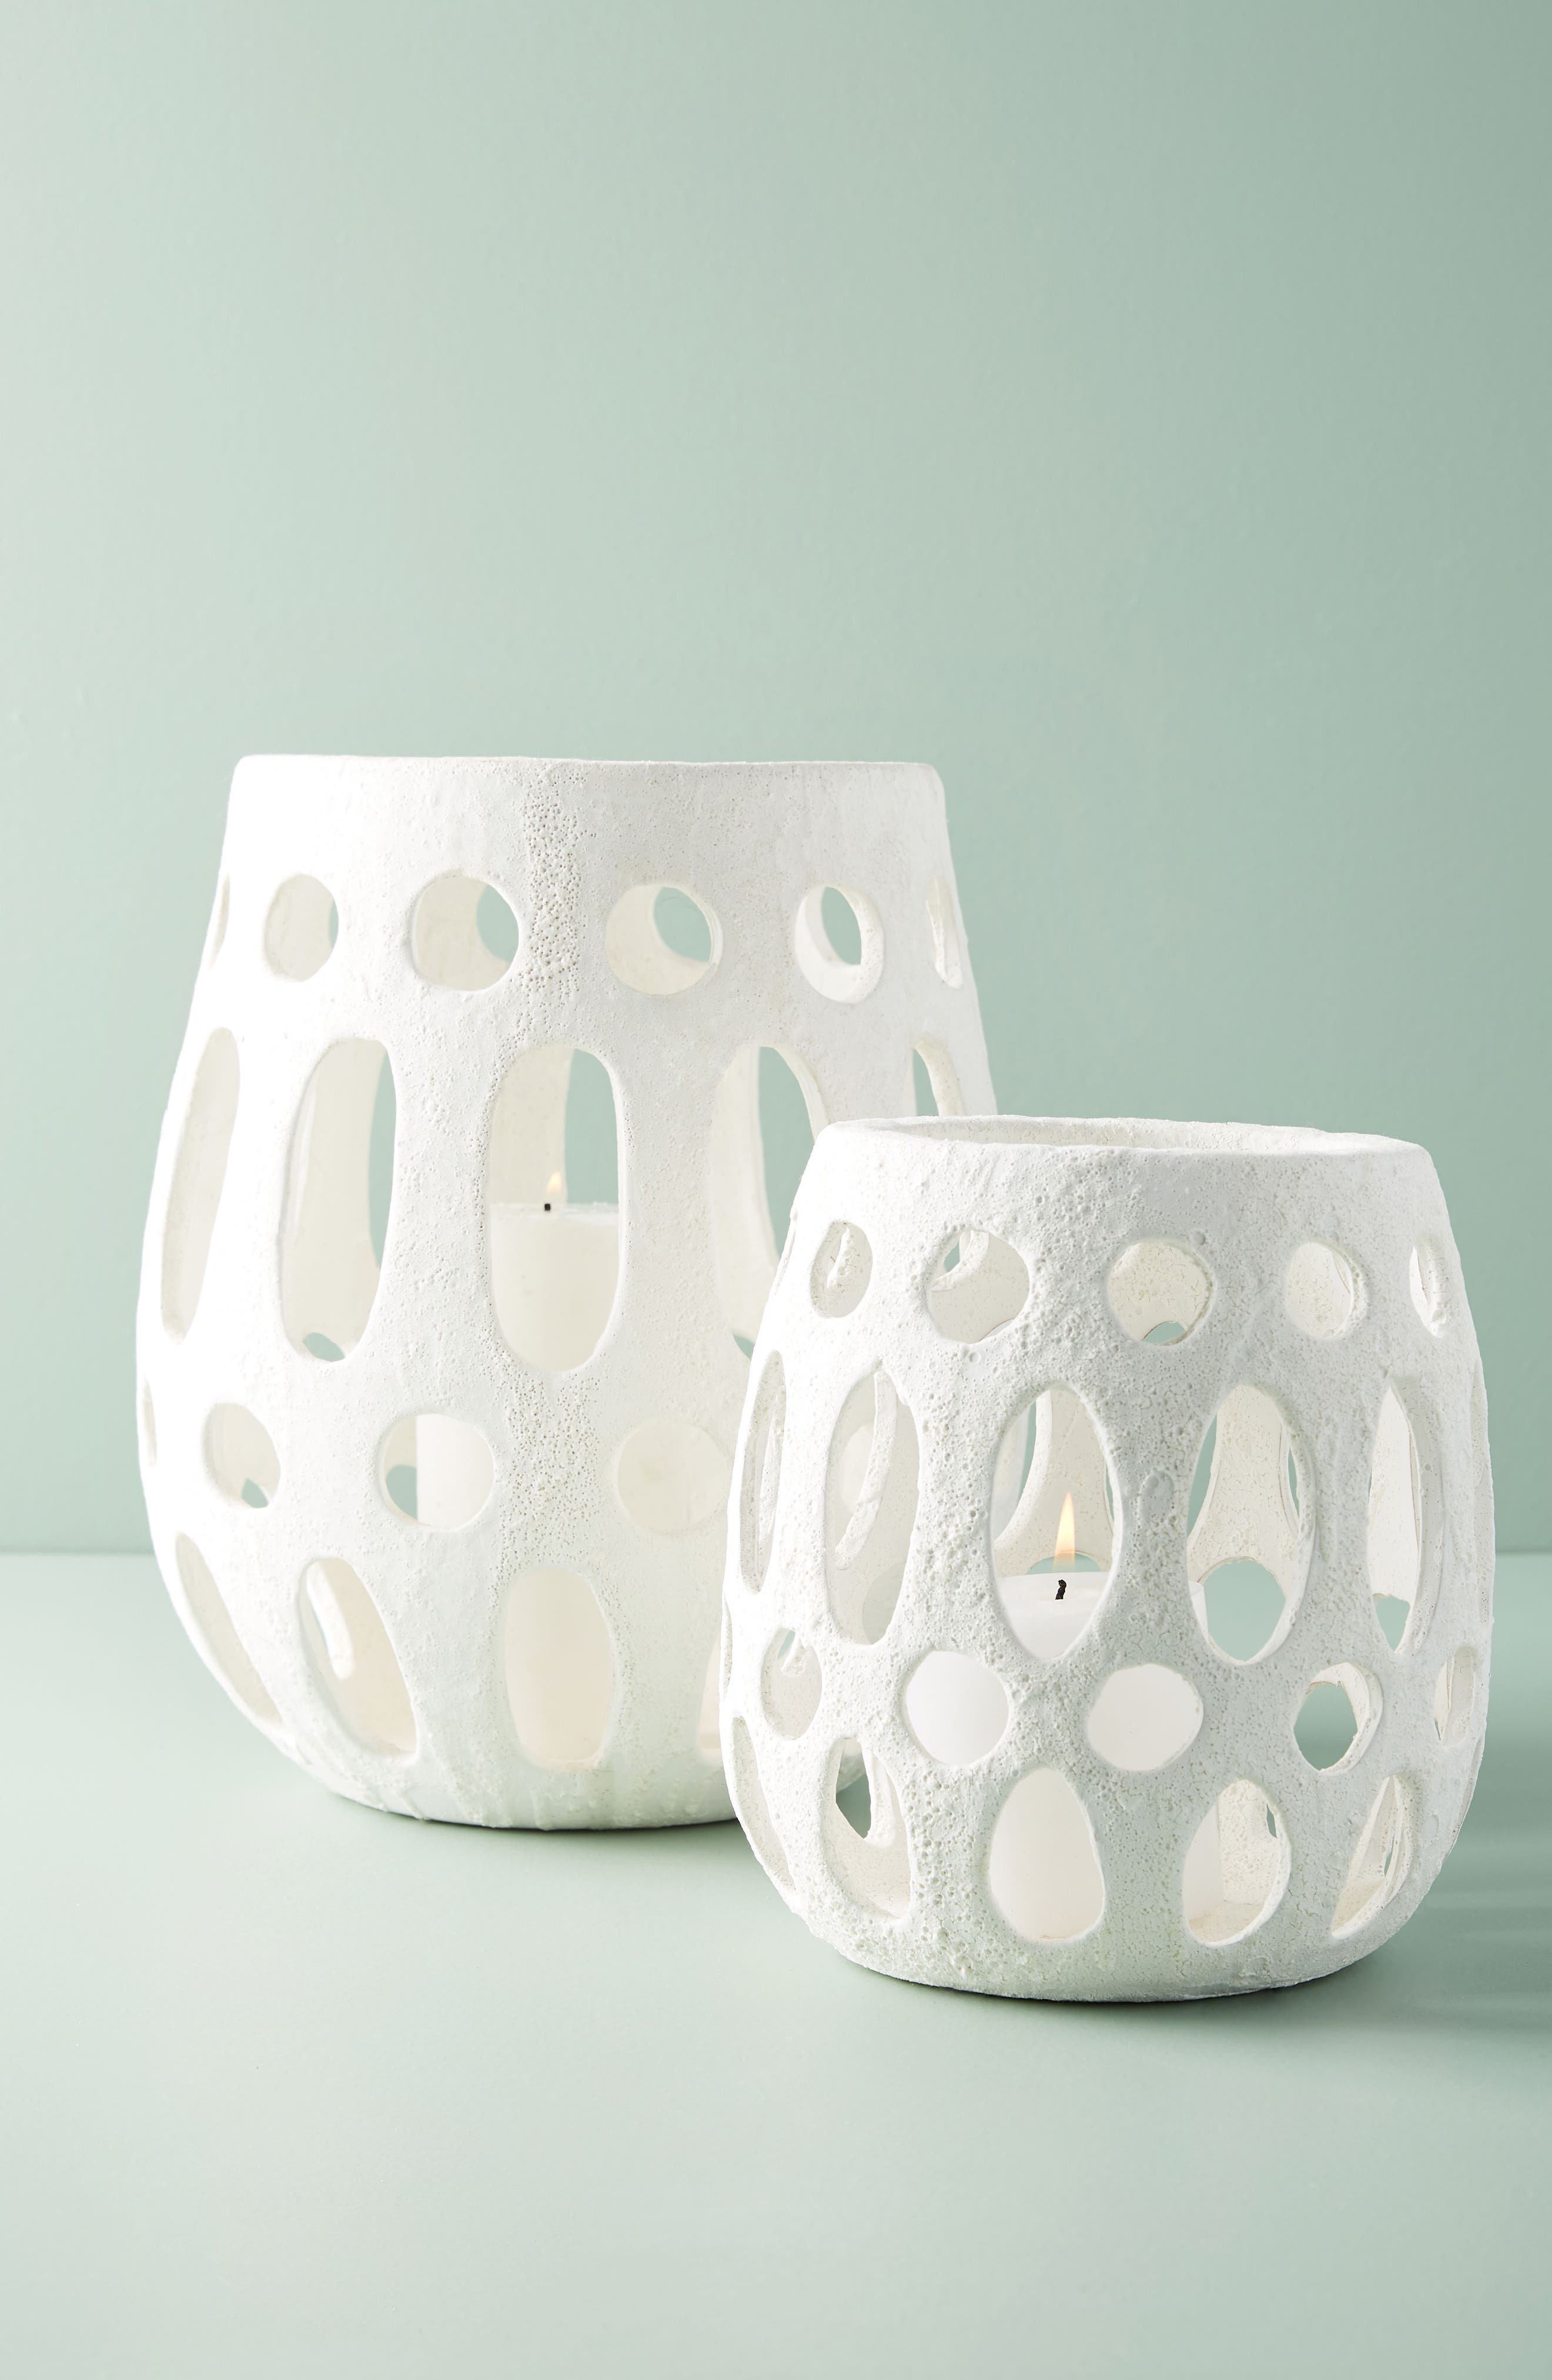 anthropologie hand carved ceramic hurricane candleholder, size medium - white